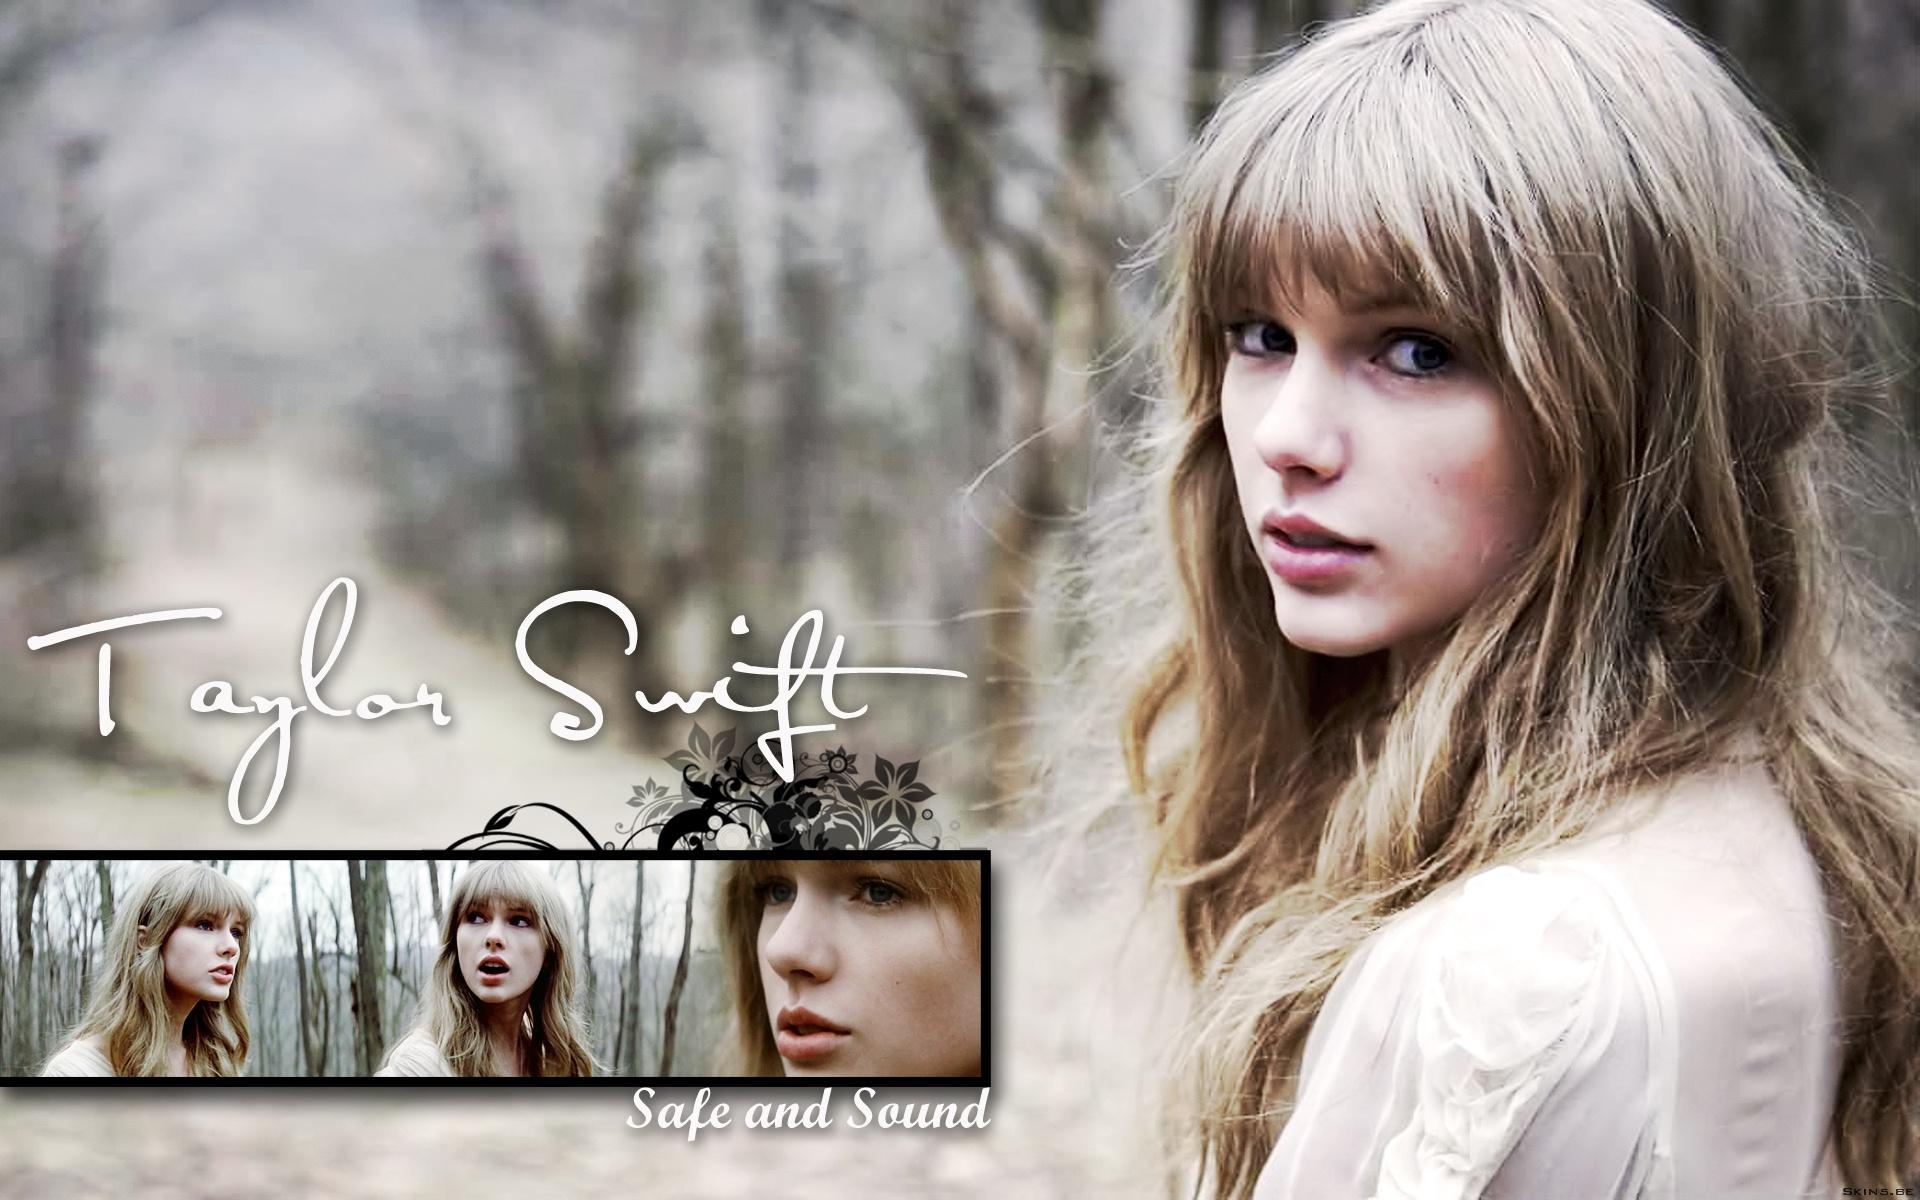 Iphone wallpaper tumblr taylor swift - Pics Photos Taylor Swift 2013 Tumblr Wallpapers